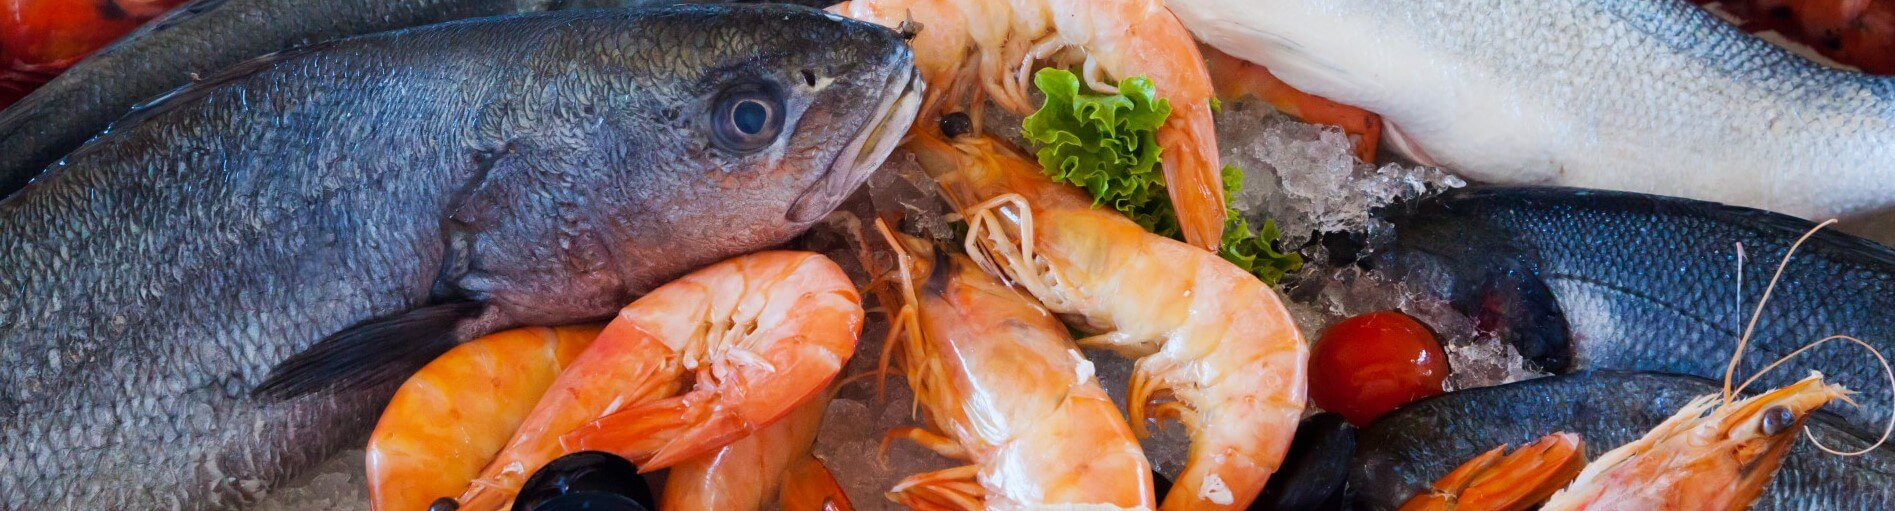 fiskekasser - Fiskekasser